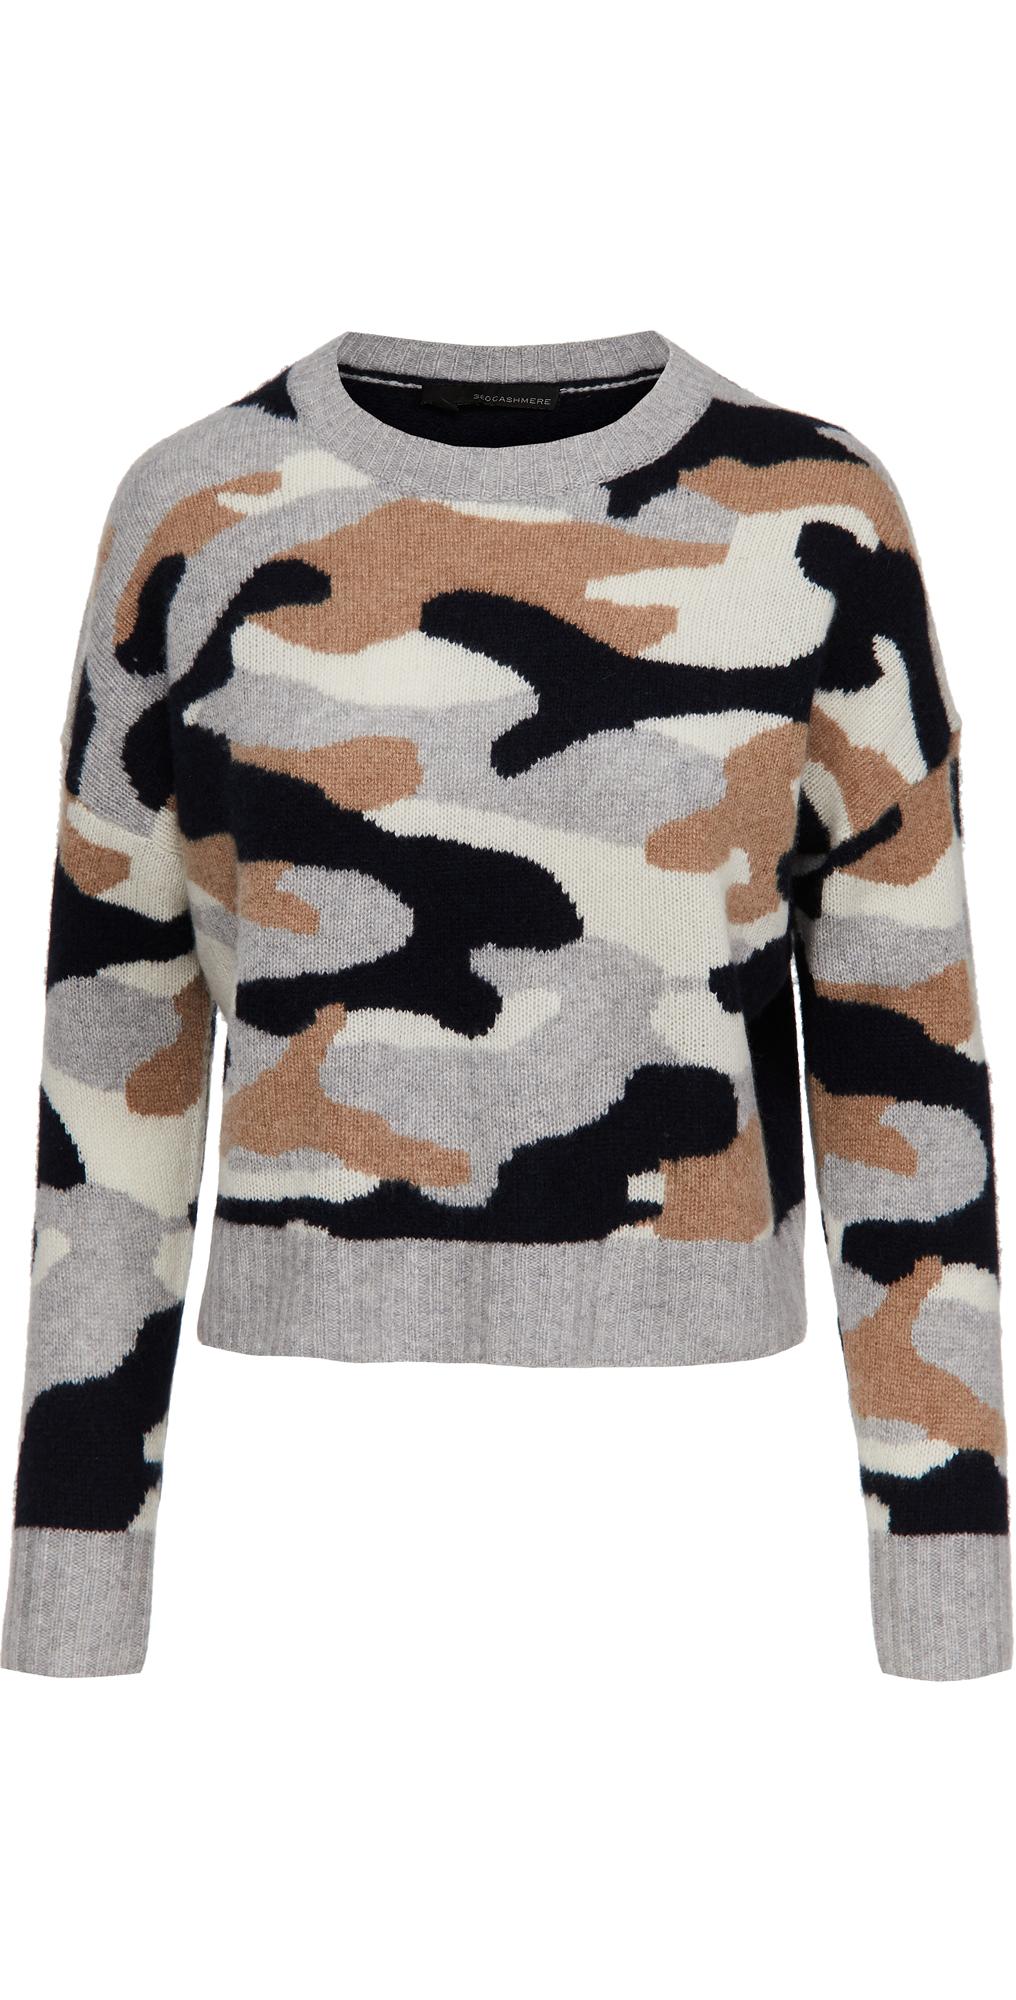 360 SWEATER Kris Cashmere Sweater